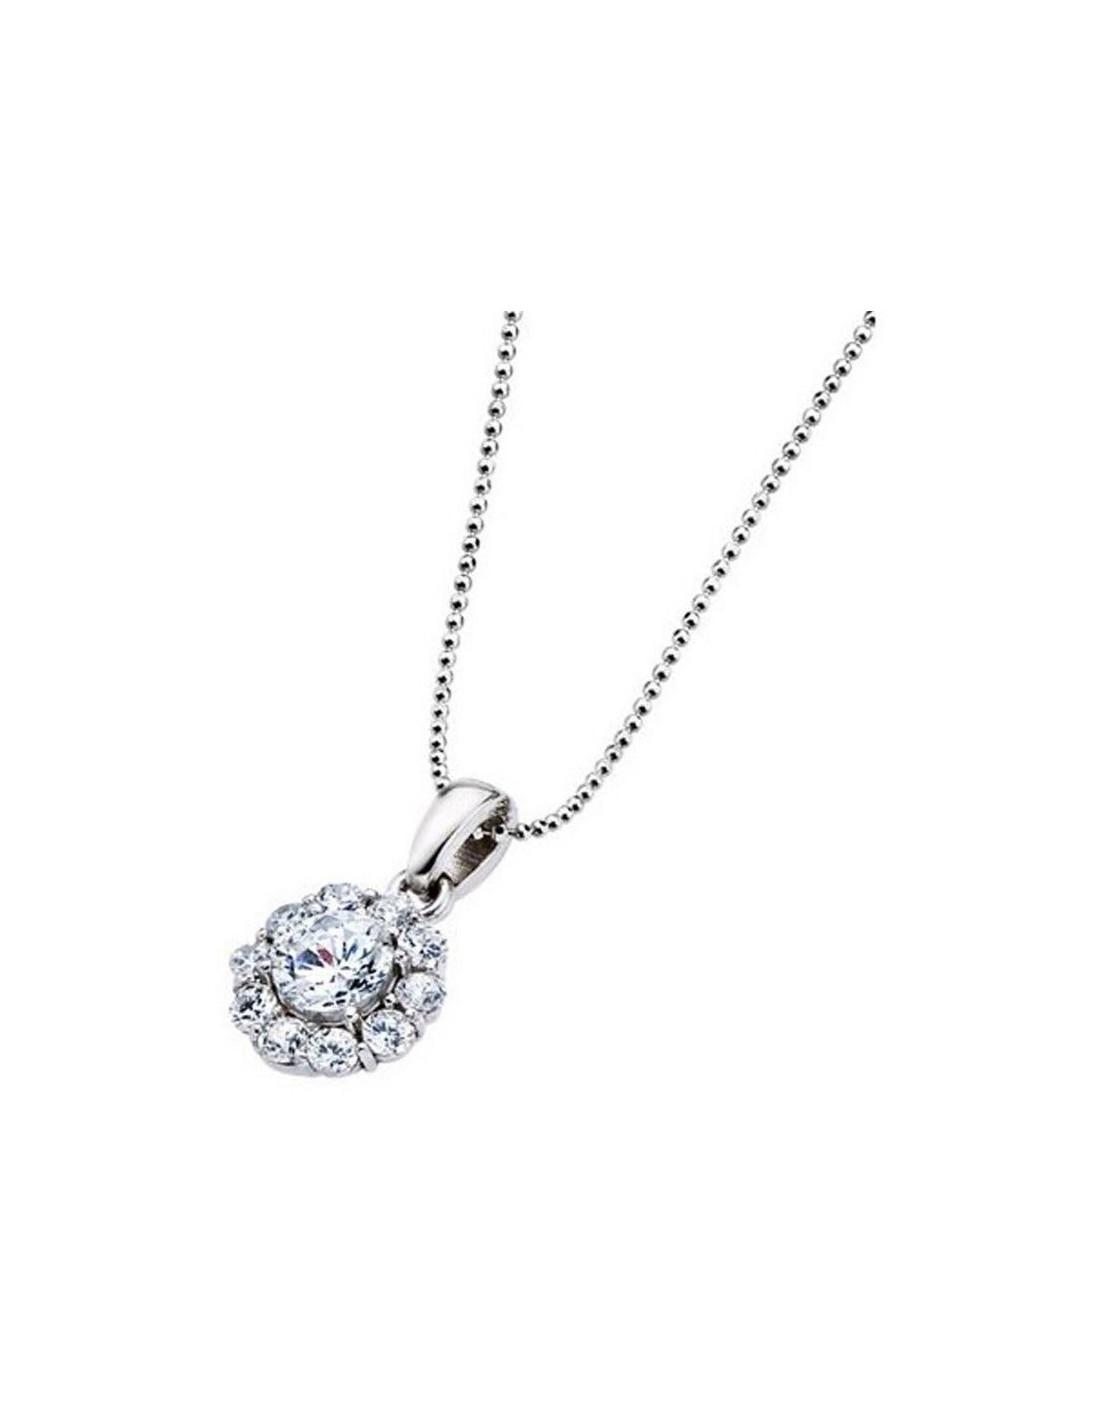 69b3c374101f Collar Lotus Silver Plata Mujer LP1290-1/1 redondo con circonitas